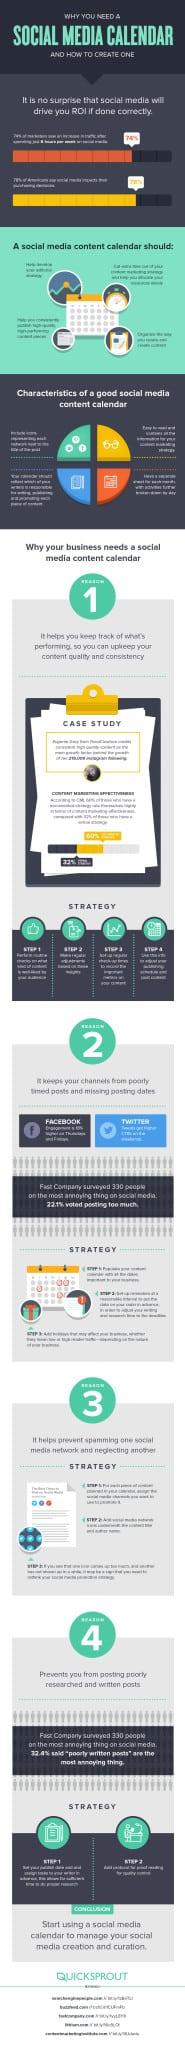 Social Media Calendar Infographic